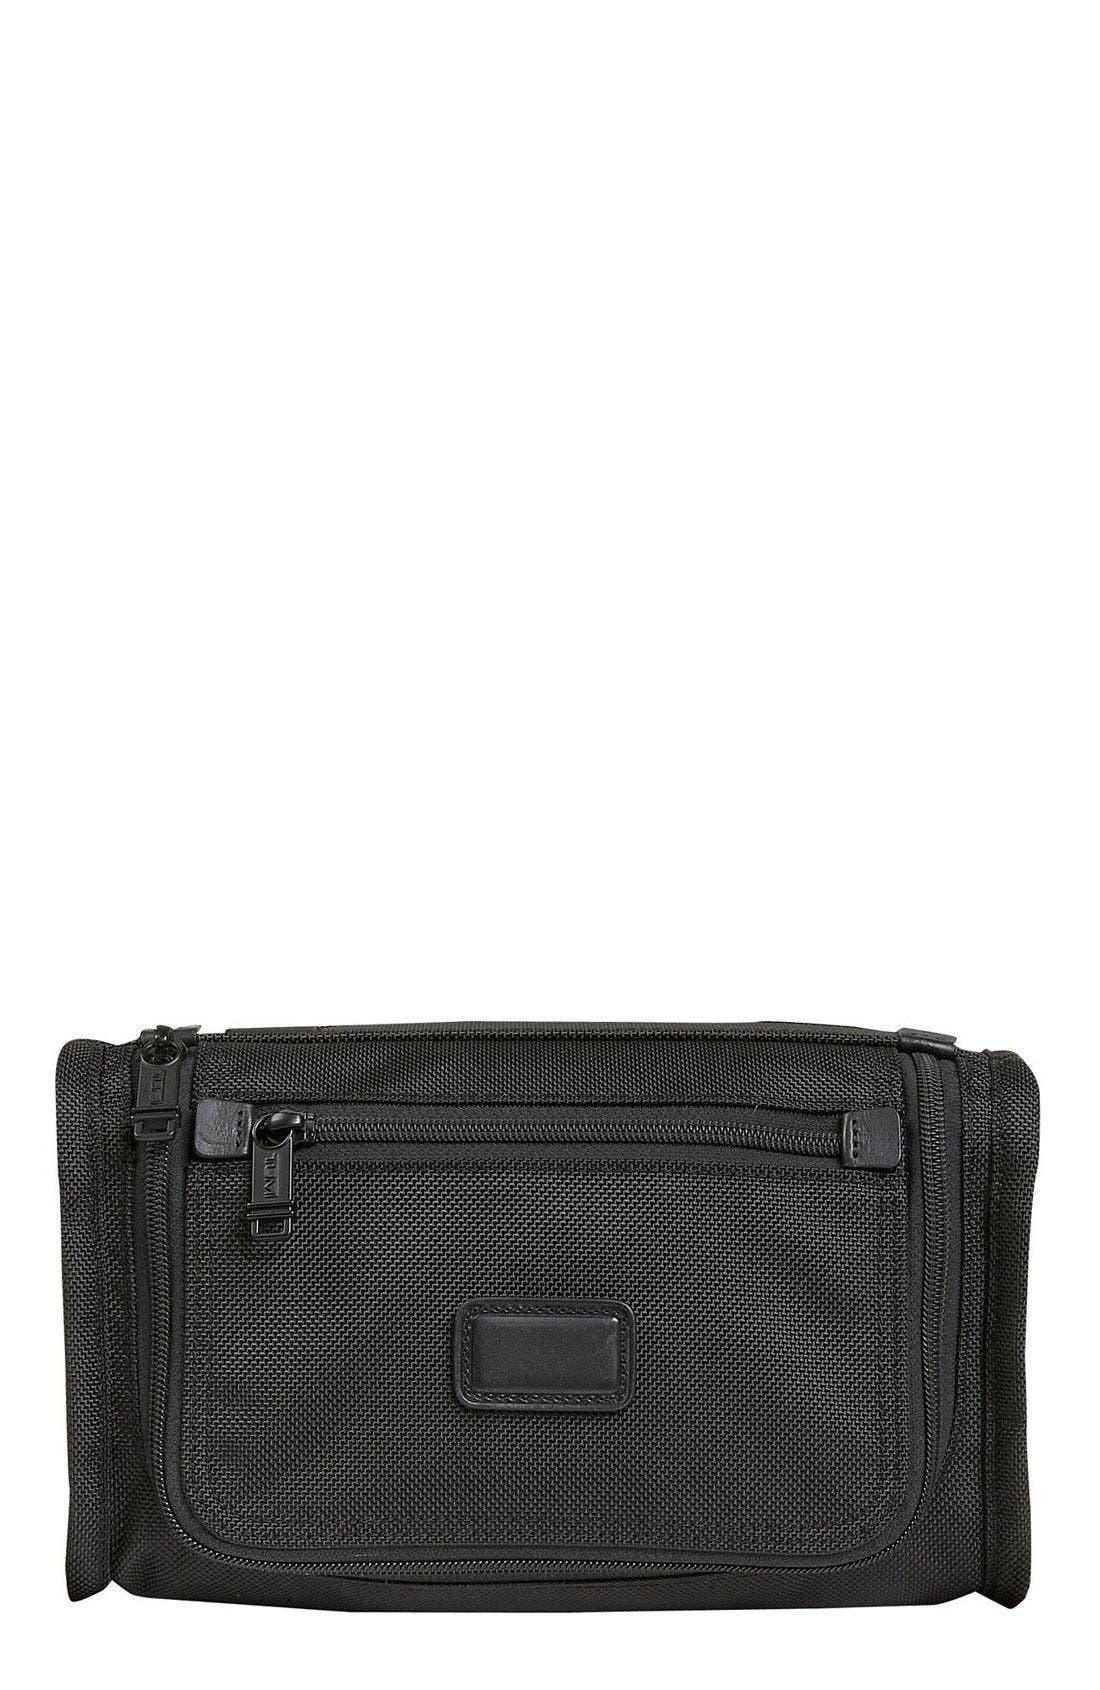 'Alpha' Travel Kit,                         Main,                         color, Black